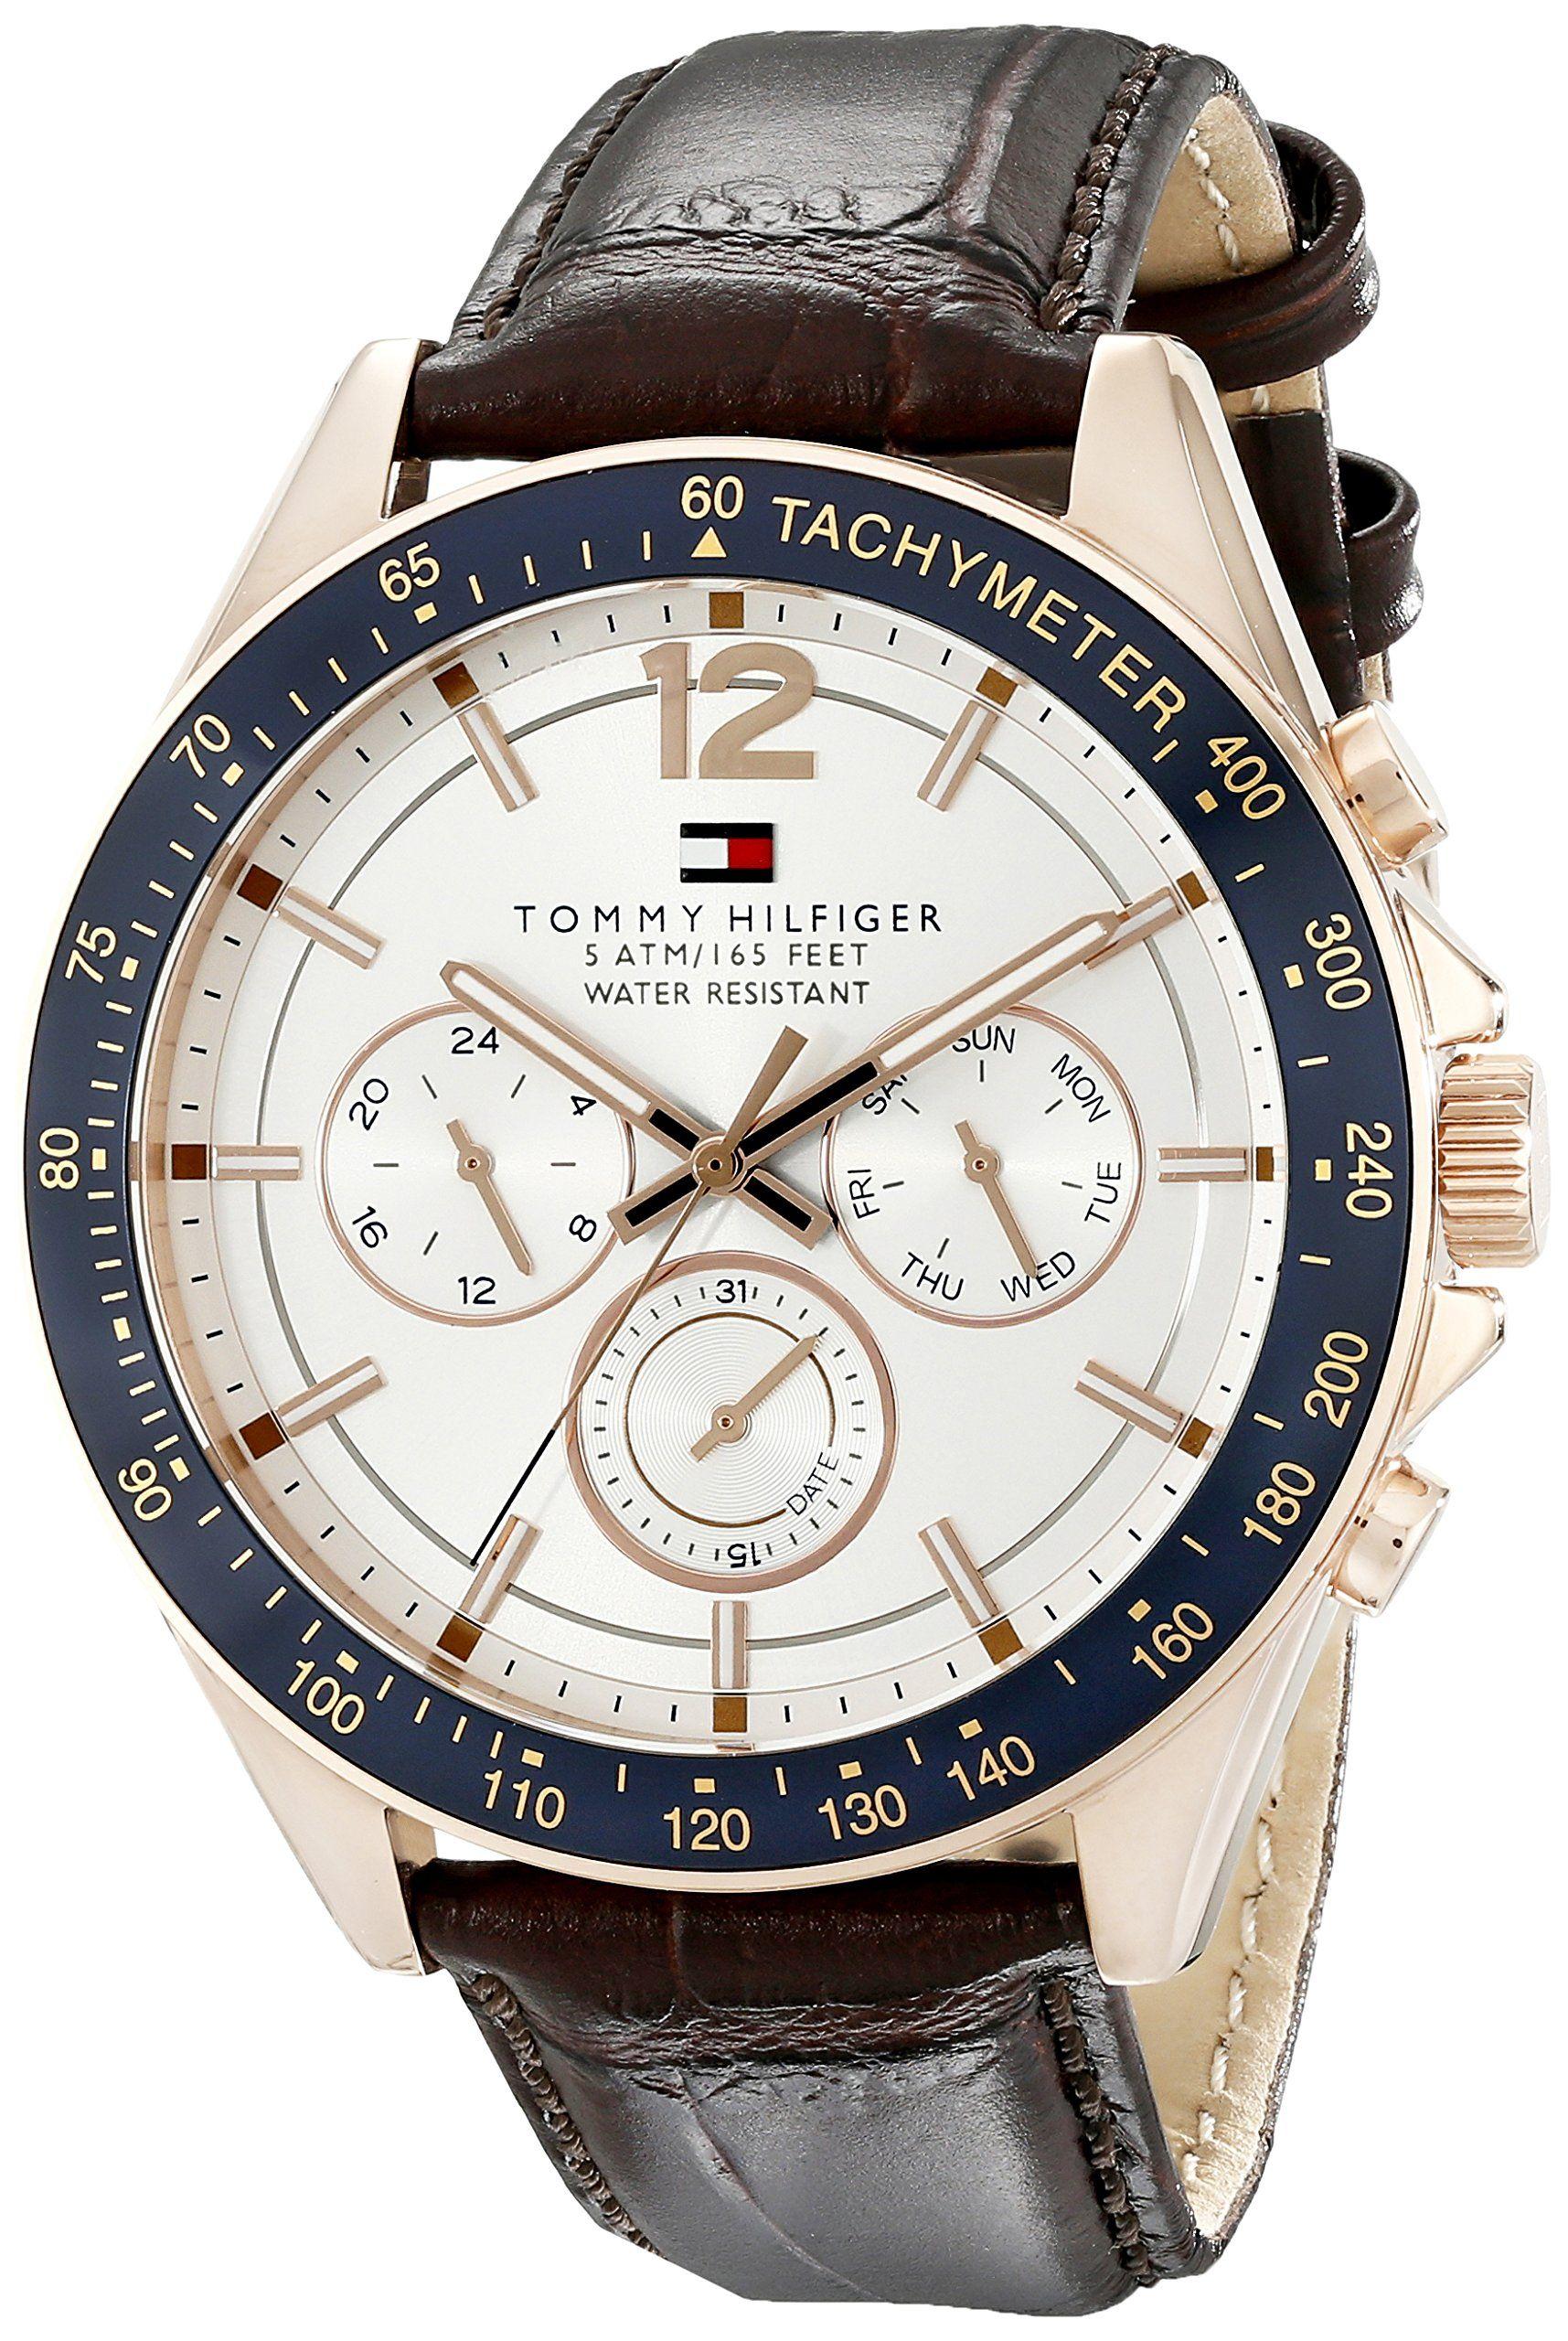 69bfc826 Tommy Hilfiger Men's 1791118 Sophisticated Sport Analog Display Quartz  Brown Watch